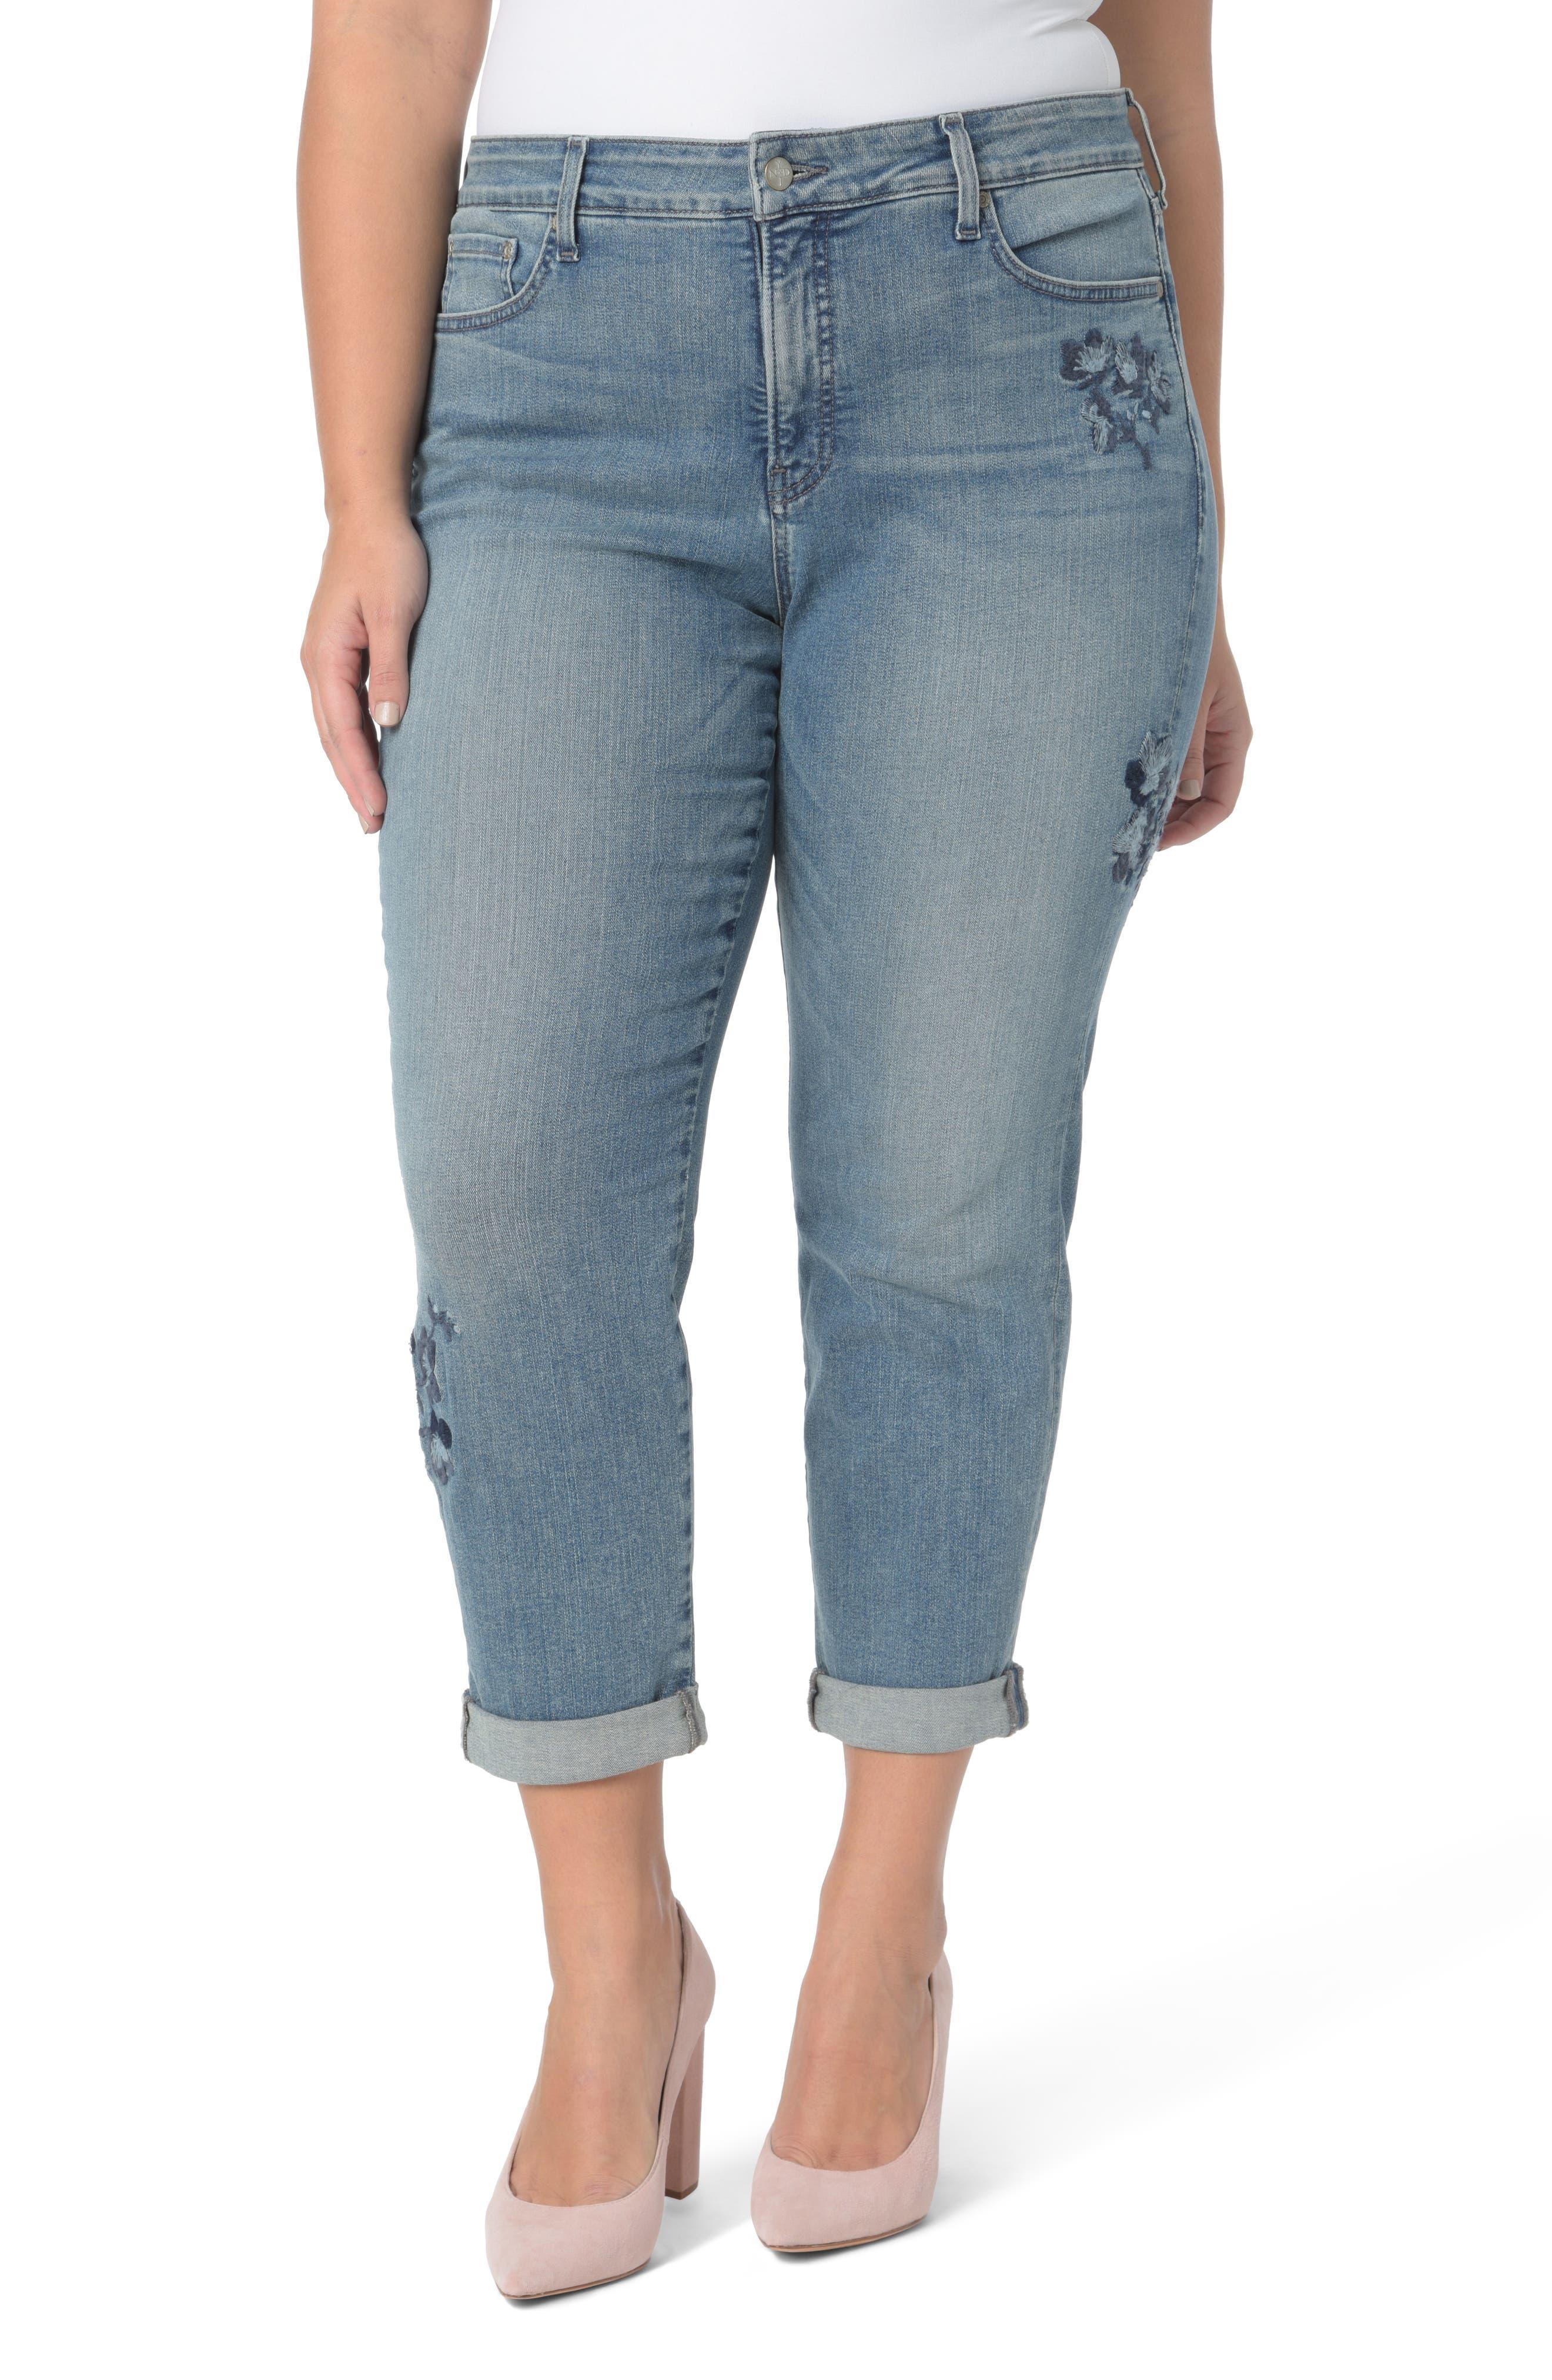 Main Image - NYDJ Floral Embroidery Boyfriend Jeans (Pacific) (Plus Size)